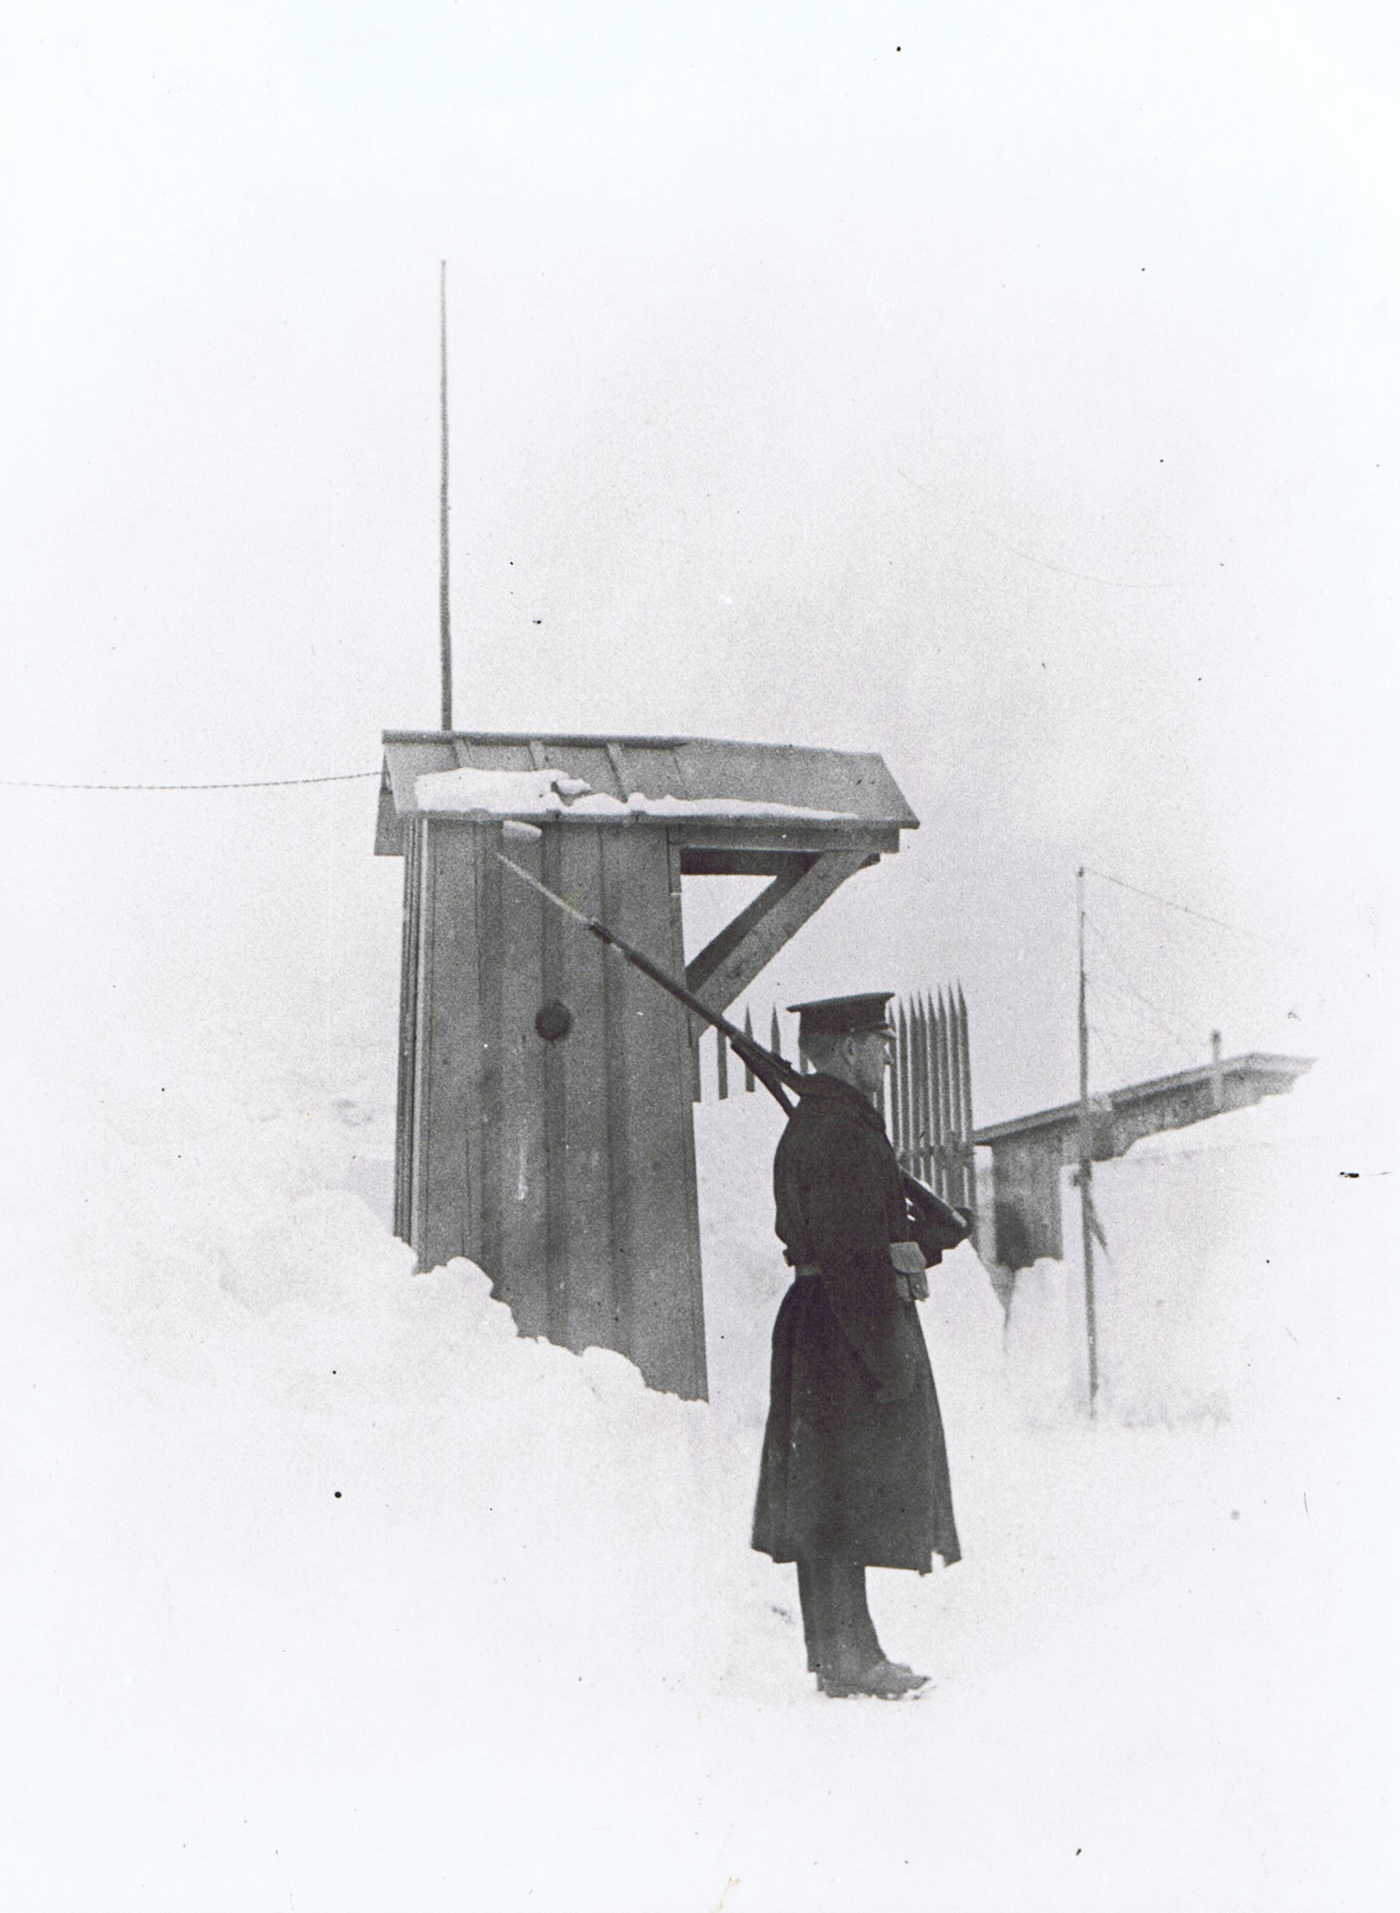 Snowed in at Fort Macaulay